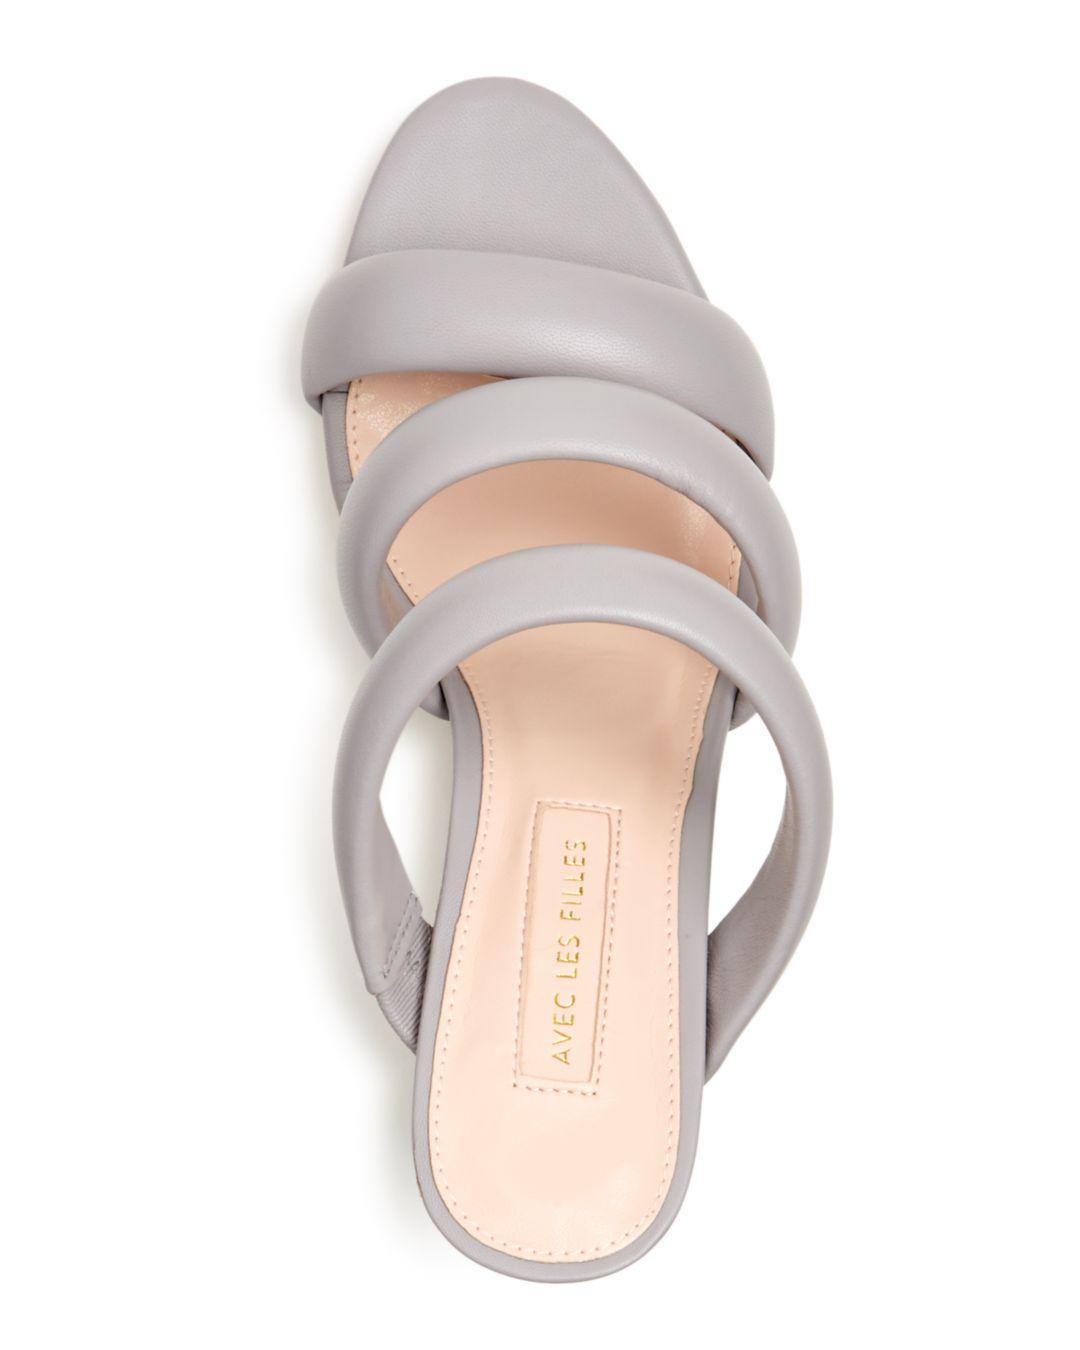 Avec Les Filles Women's Mara Leather High heel Slide Sandals